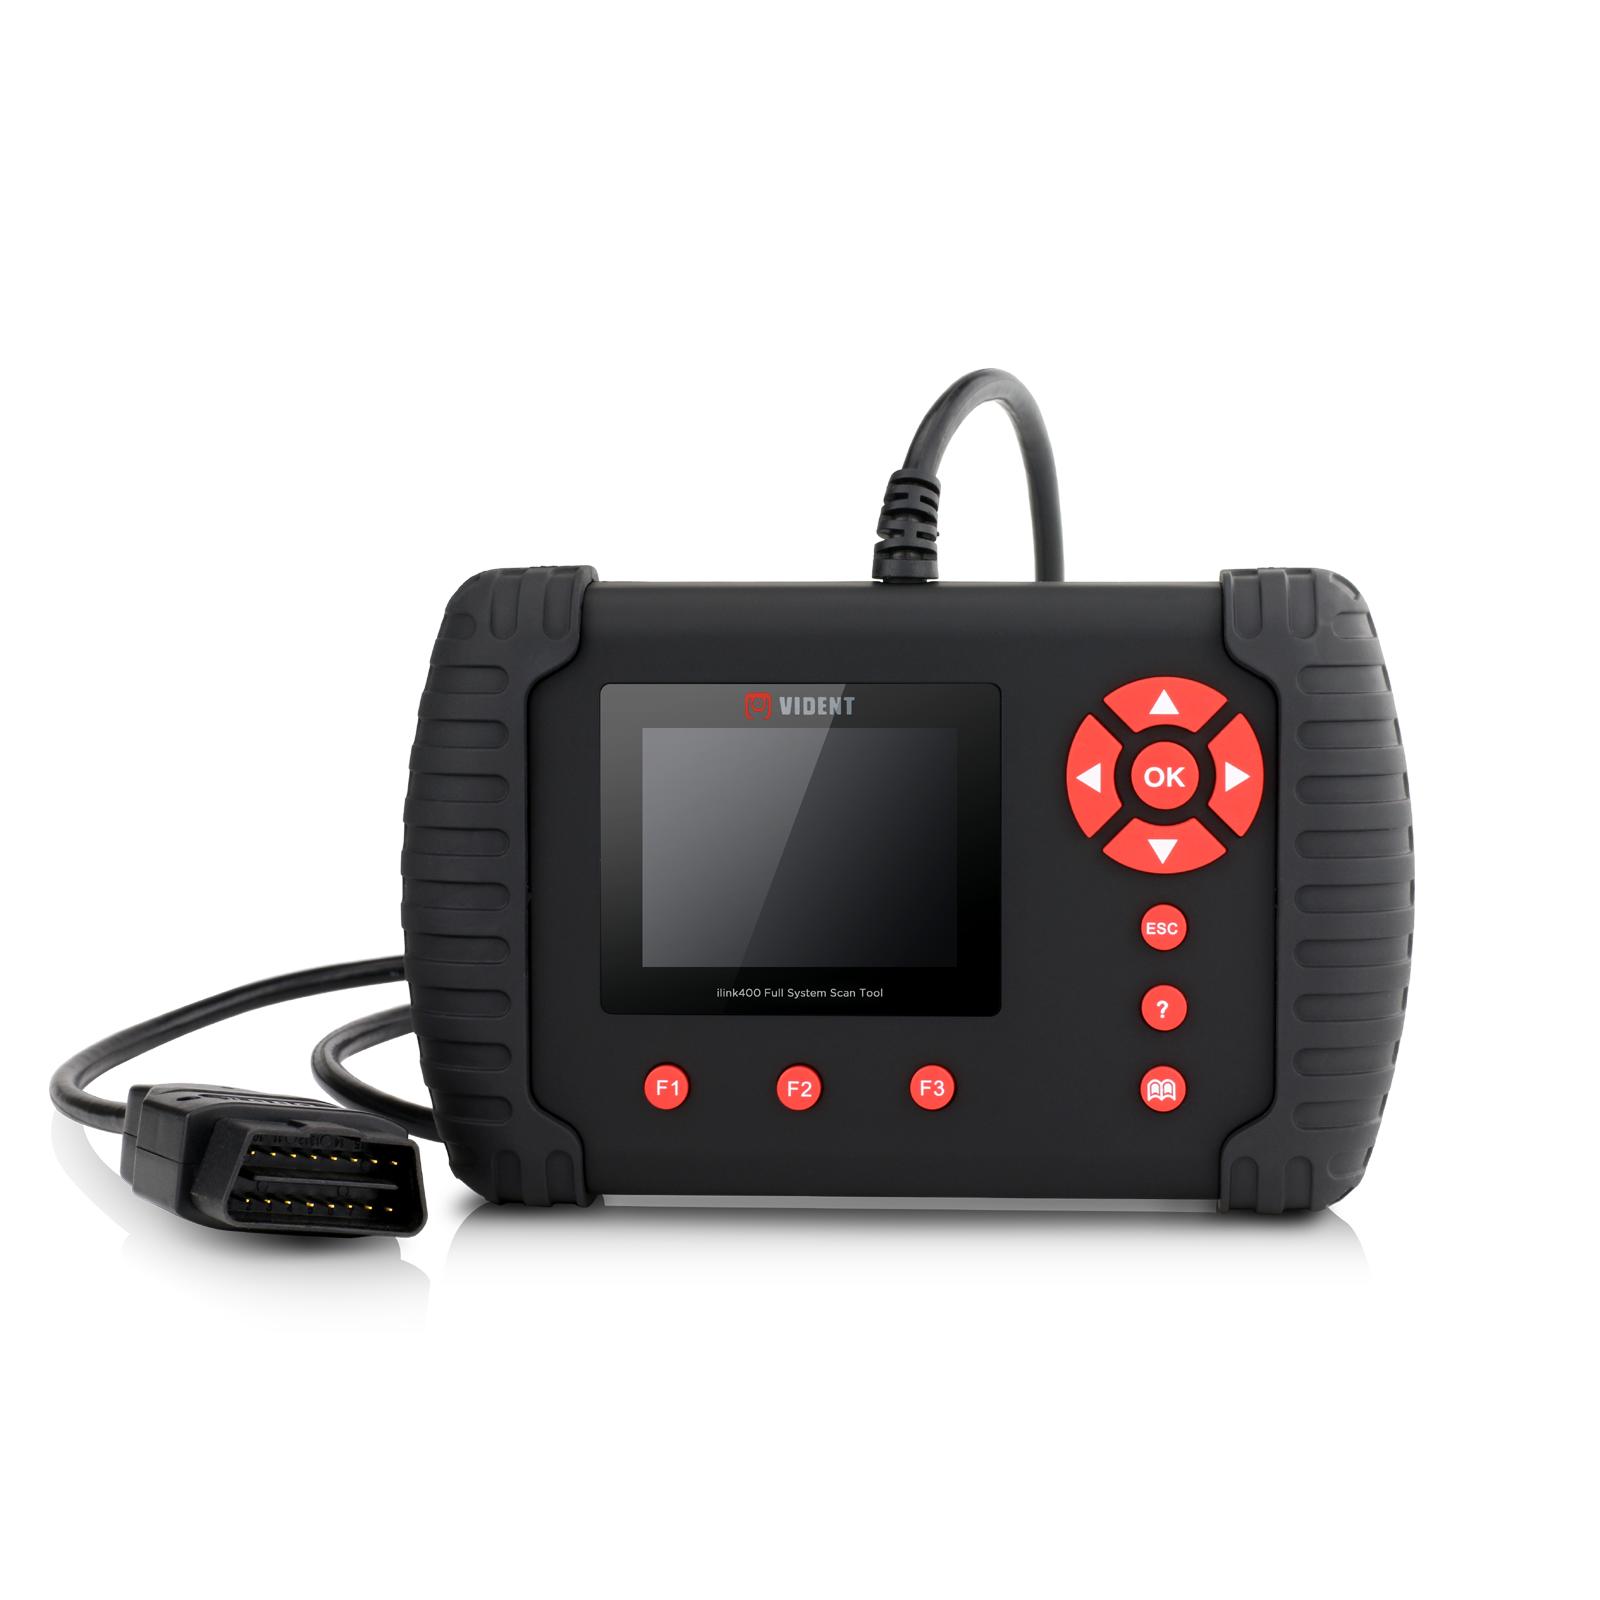 Vident Ilink400 Full System Single Make Obd11 Scan Tool